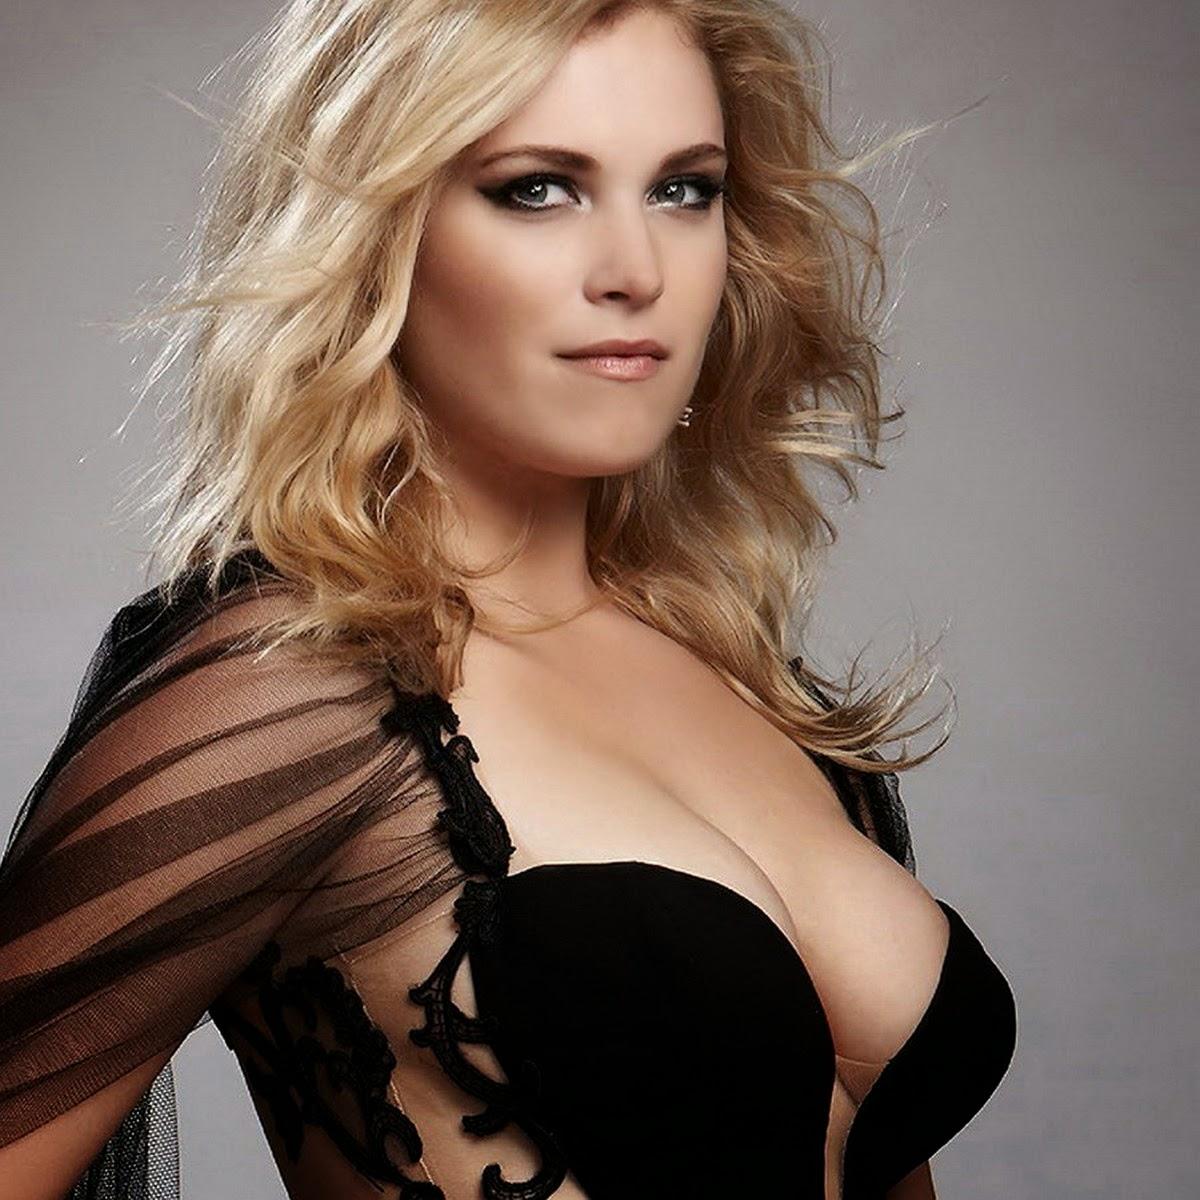 Eliza Taylor sexy cleavage.jpg « MyConfinedSpace